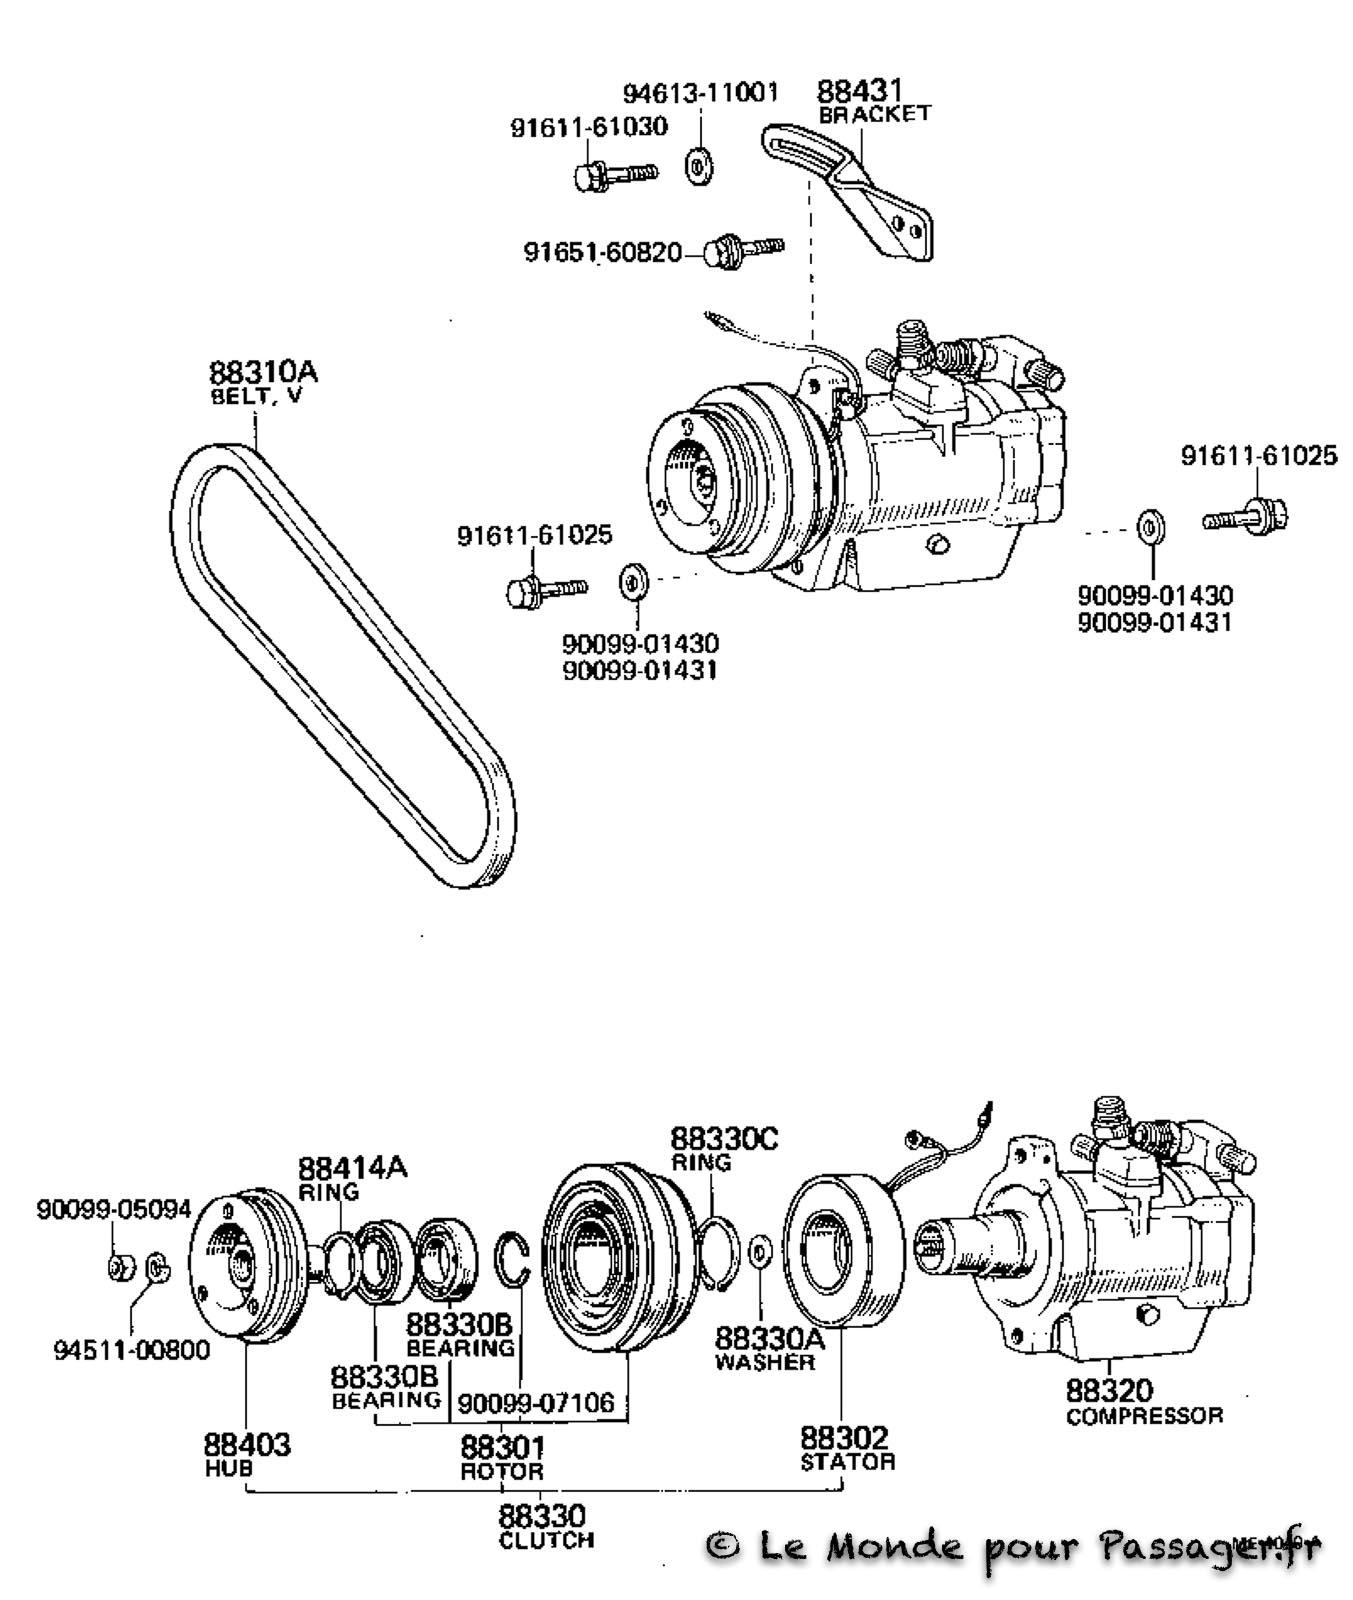 Fj55-Eclatés-Techniques020